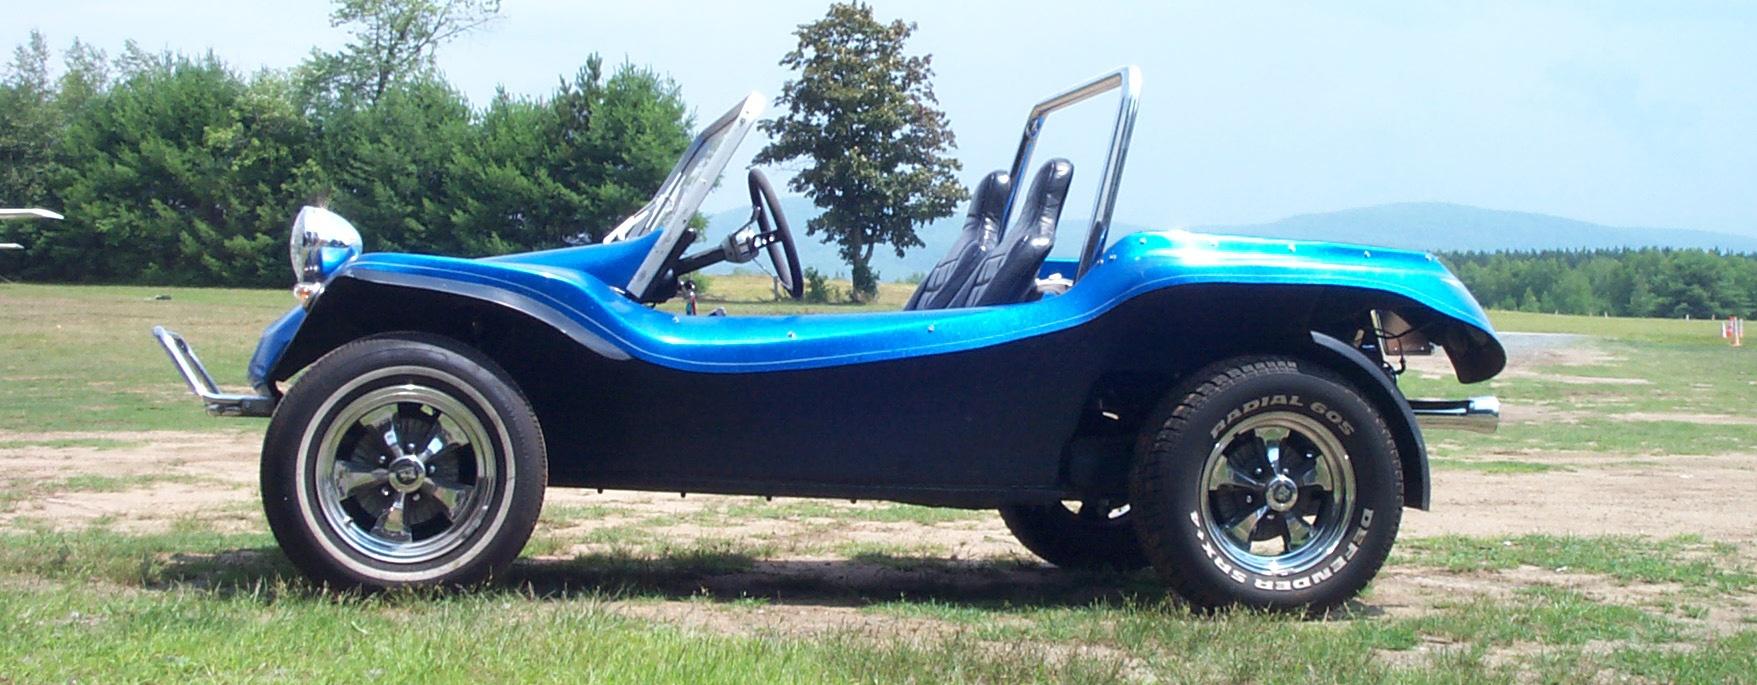 Adirondack Aircooled Myers Manx Clone Berrien Nostalgia Dune Buggy